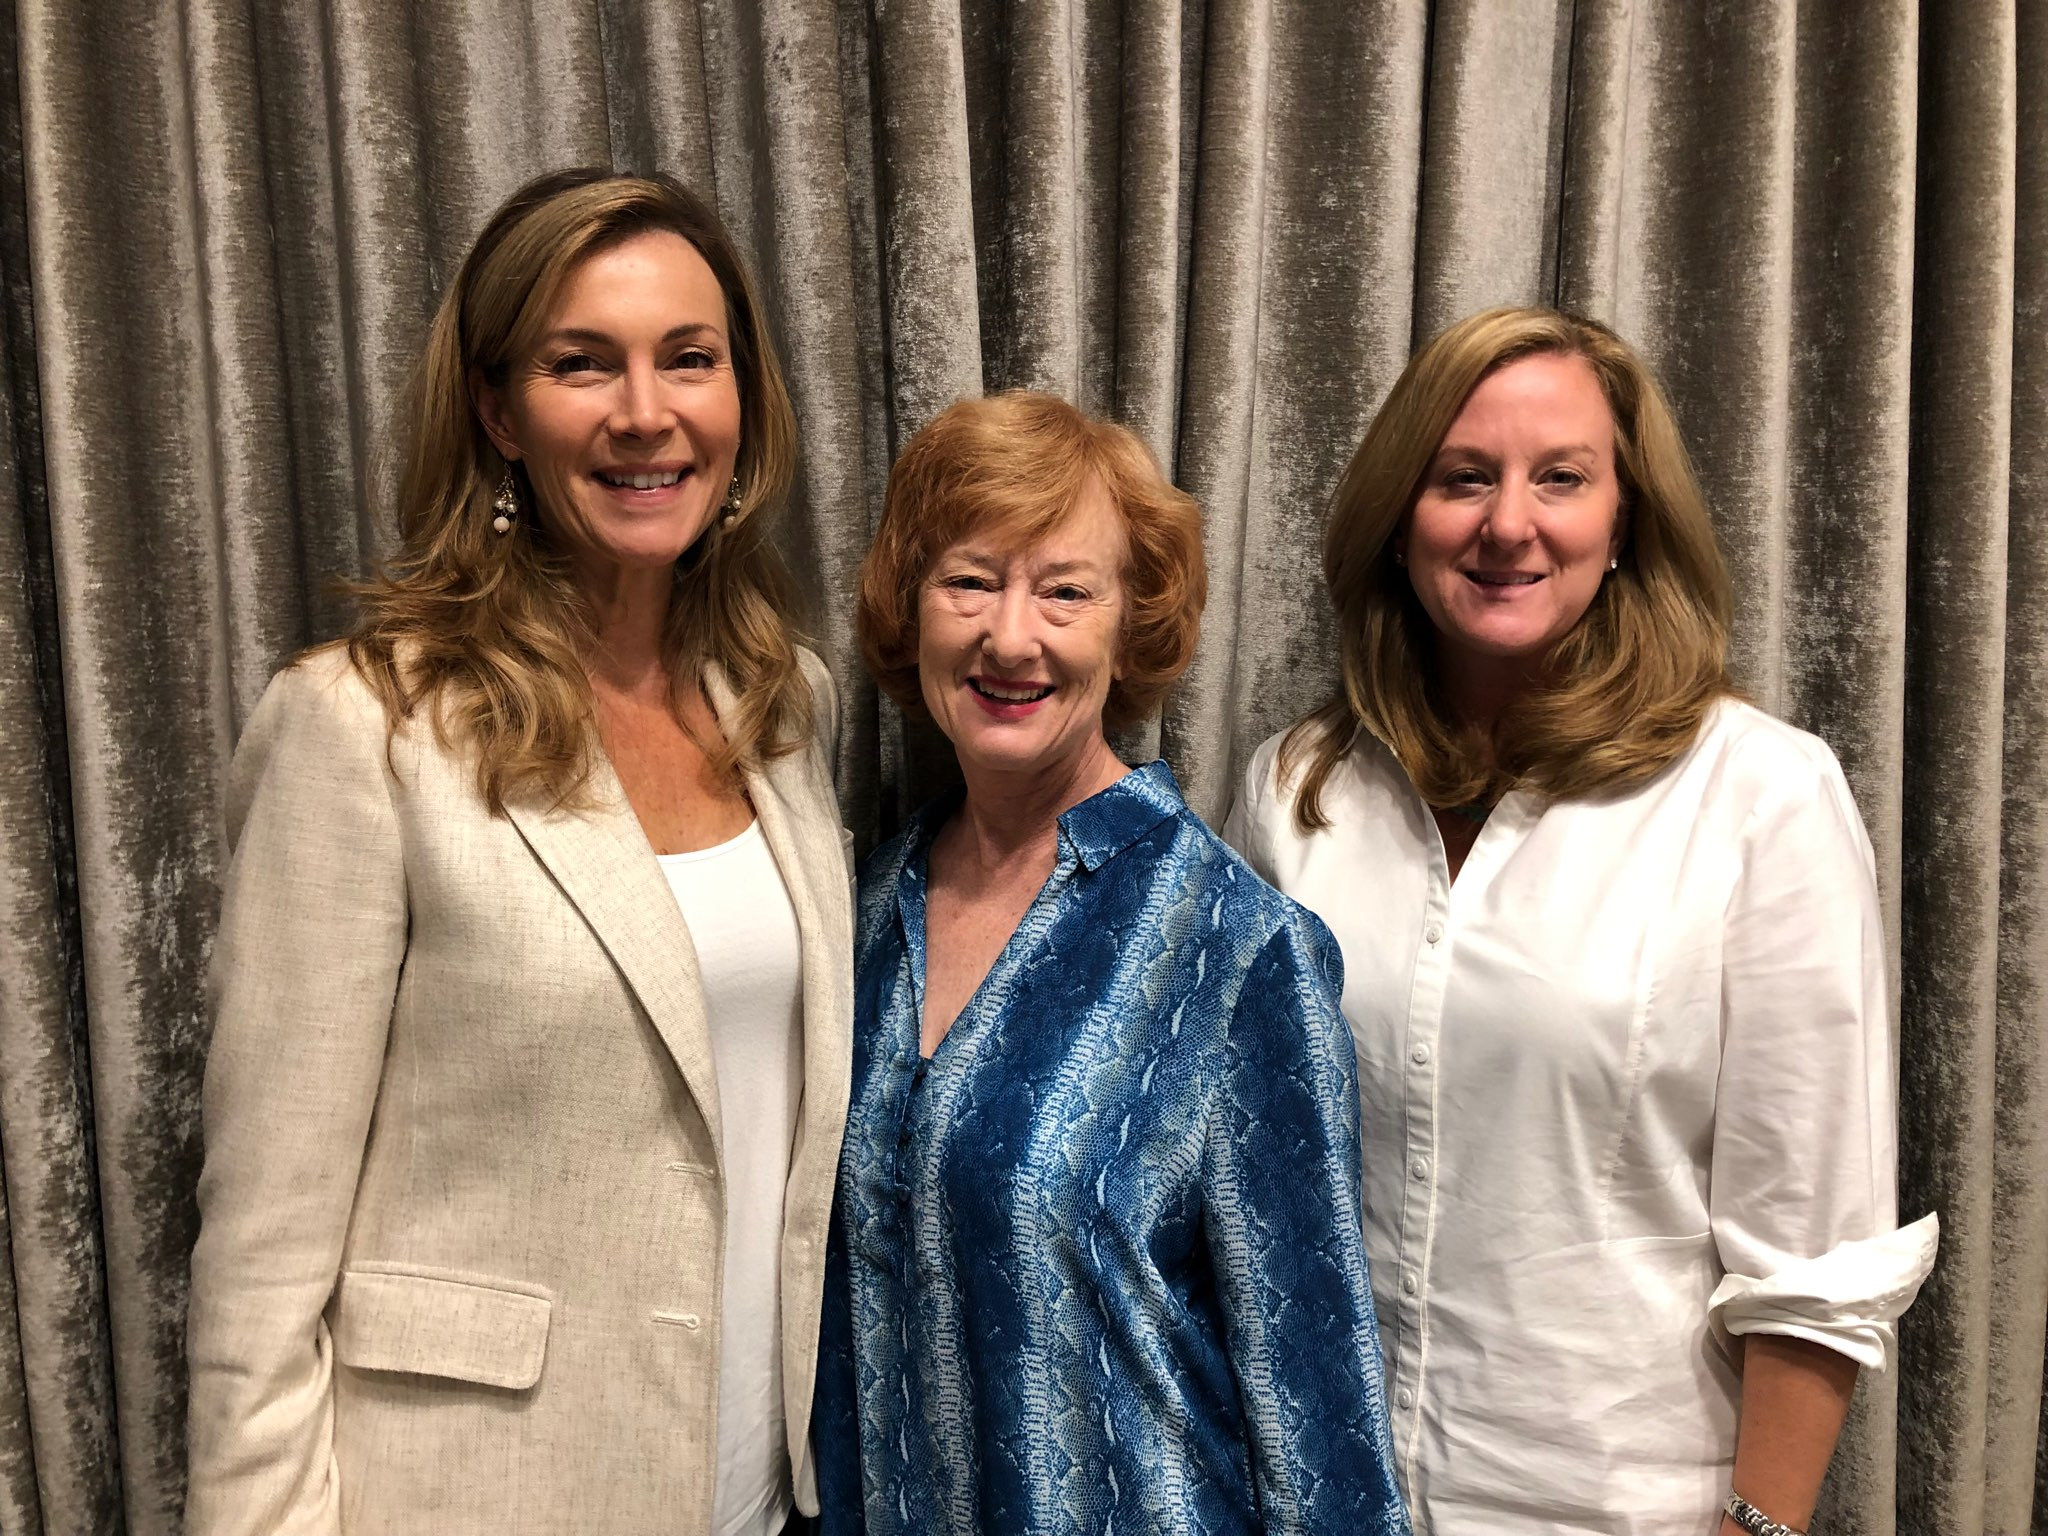 2019-2020 Leadership Team: Leisha Nischan, Jocelynne McCall, Mary Lampley (left to right)